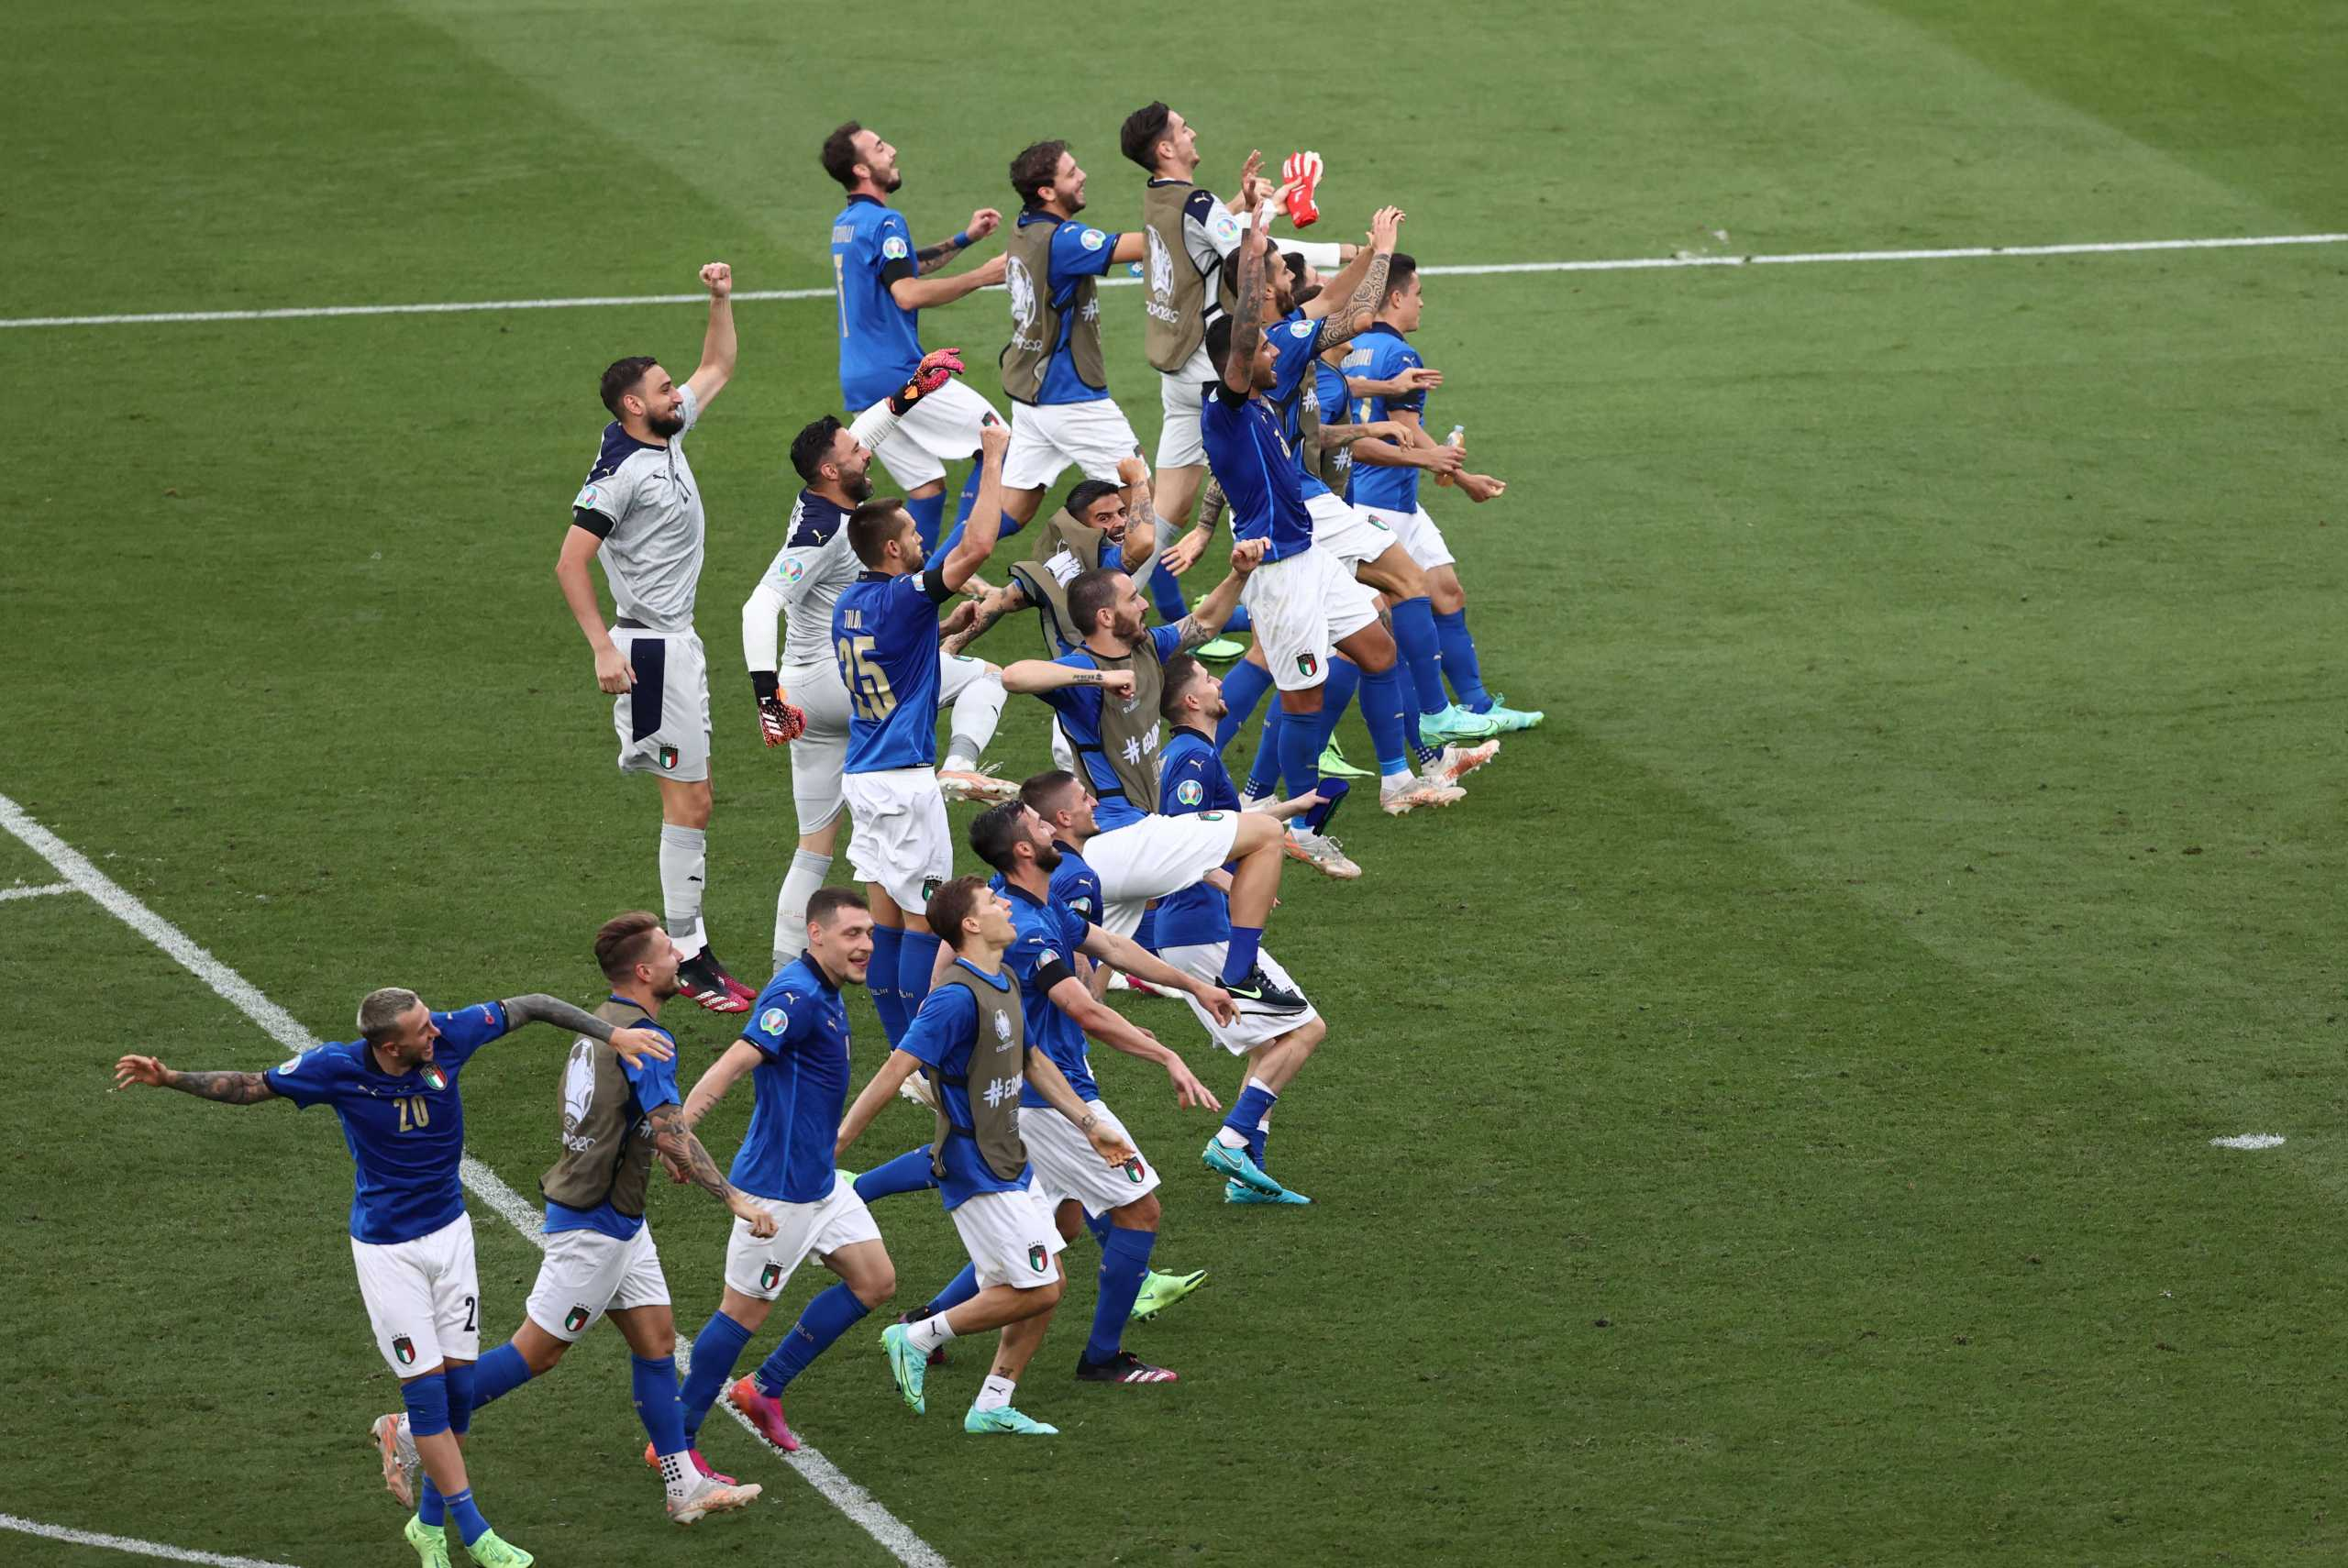 Euro 2020, Ιταλία – Ουαλία 1-0:  Πρώτη και καλύτερη στους «16» η «σκουάντρα ατζούρα»